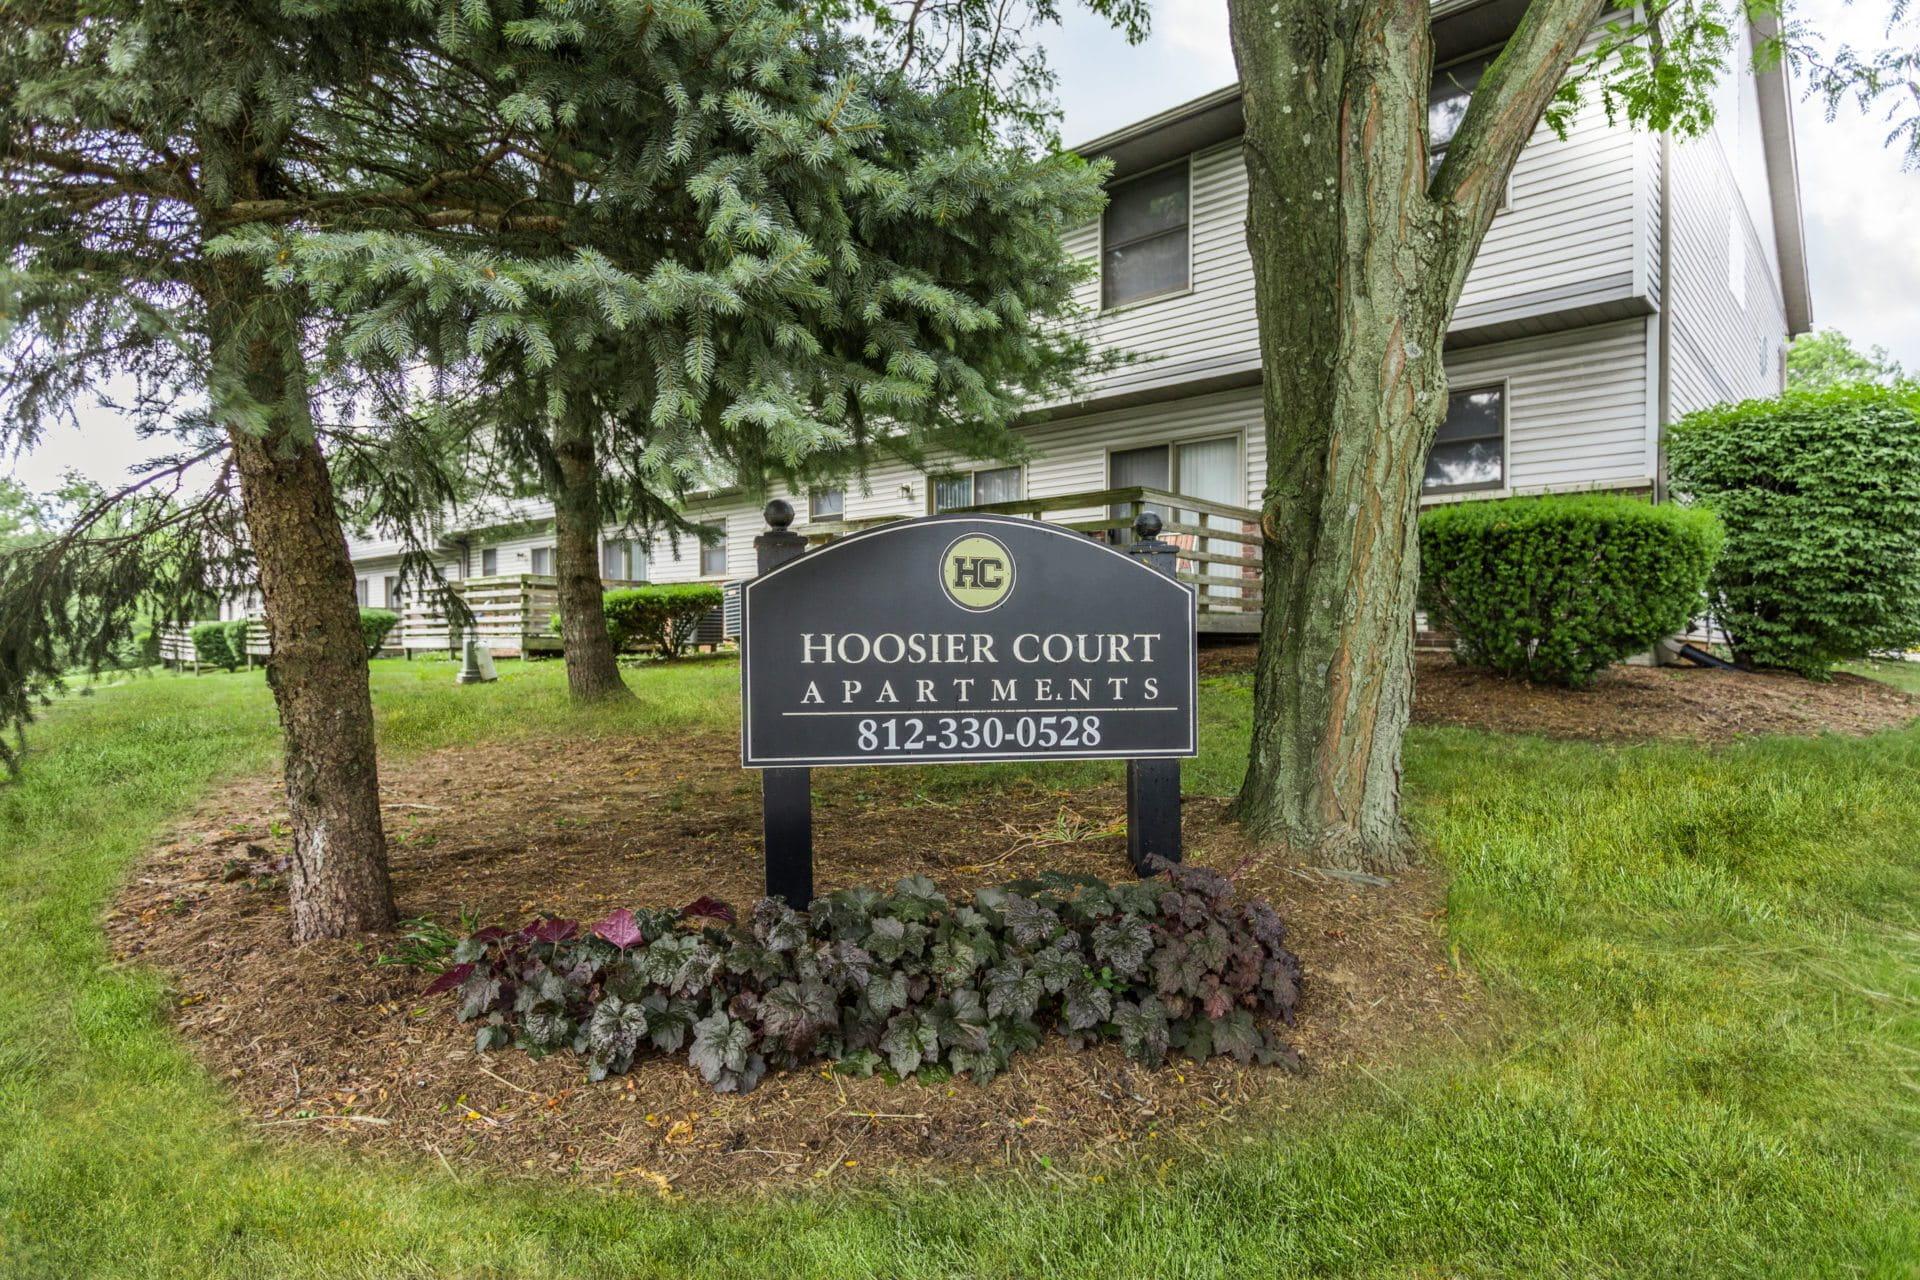 Hoosier Court Apartments